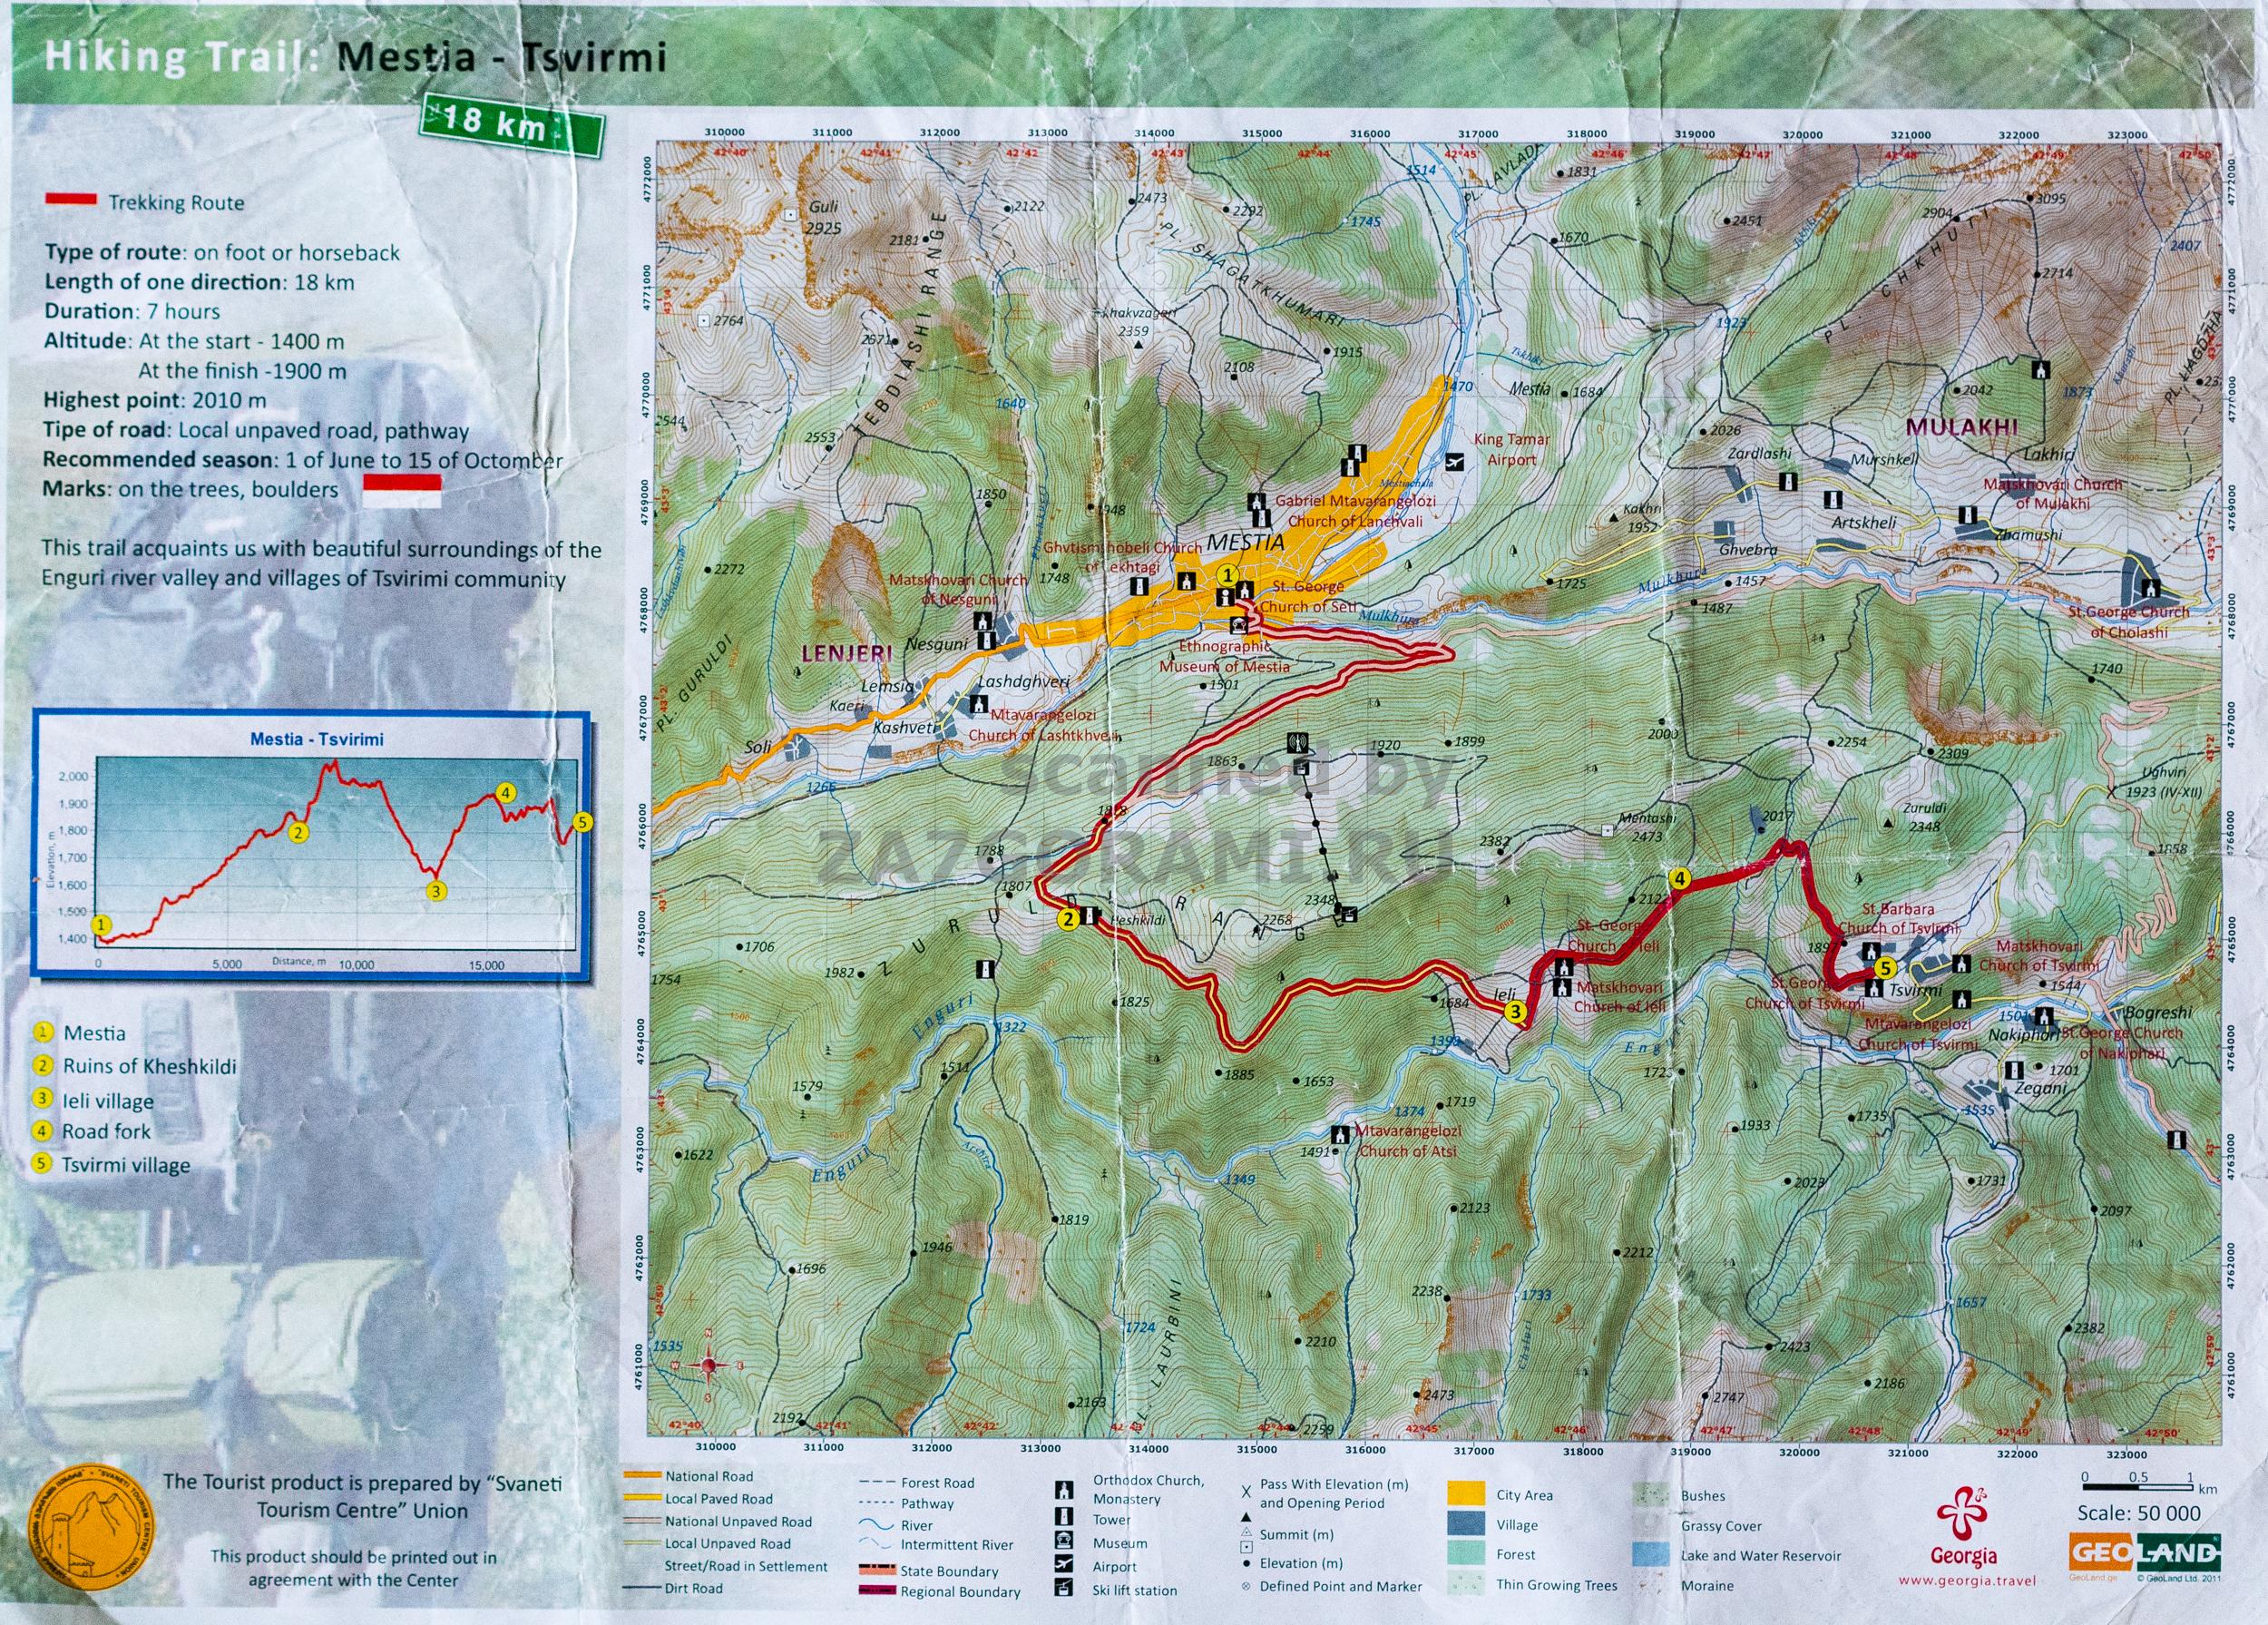 Карта Местия - Хацвали - Цвирми